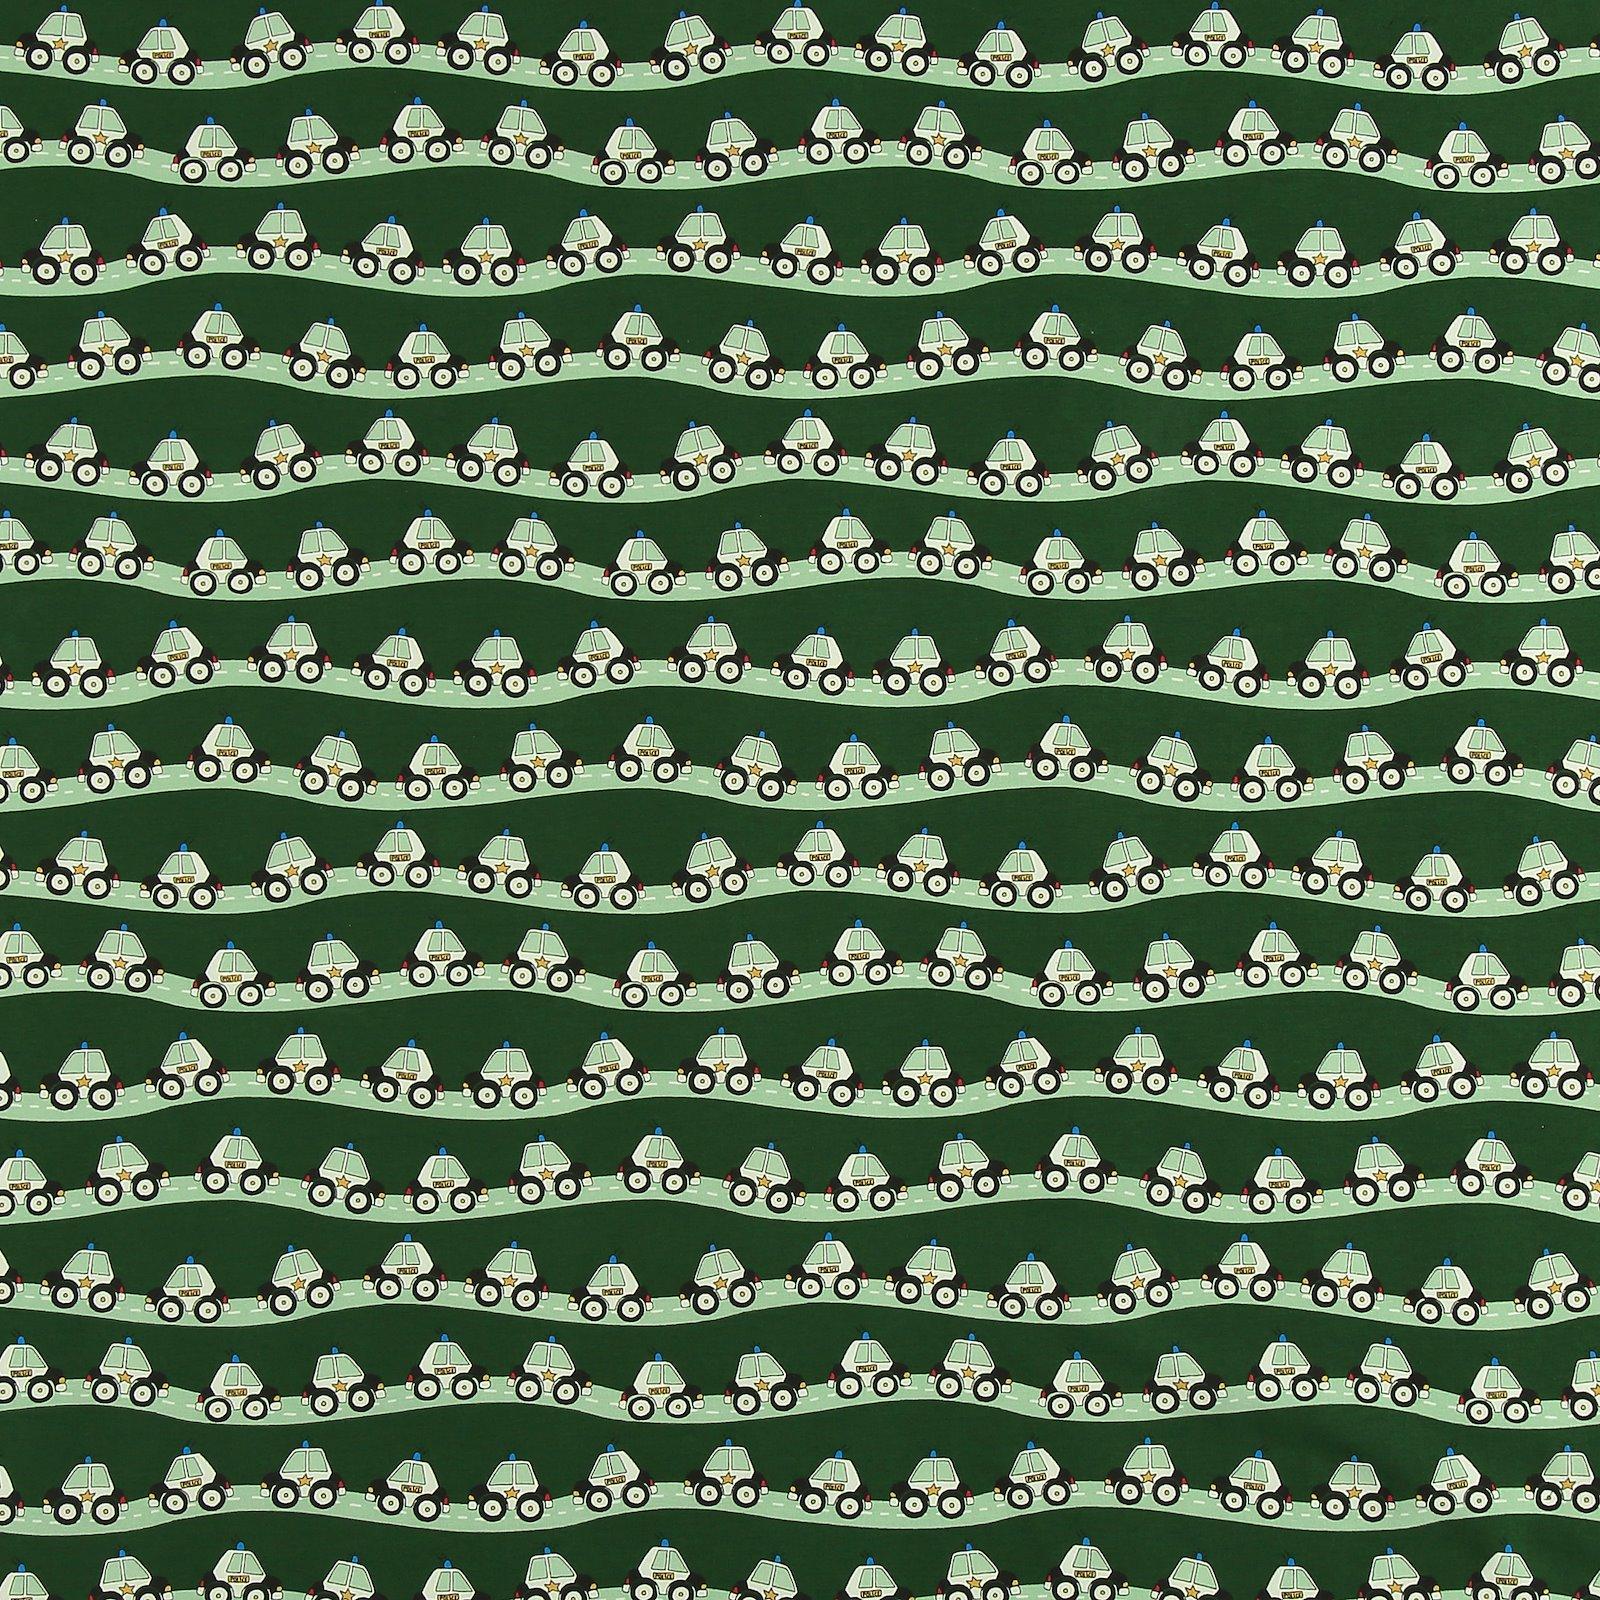 Organic stretch jersey dark green w cars 272709_pack_sp